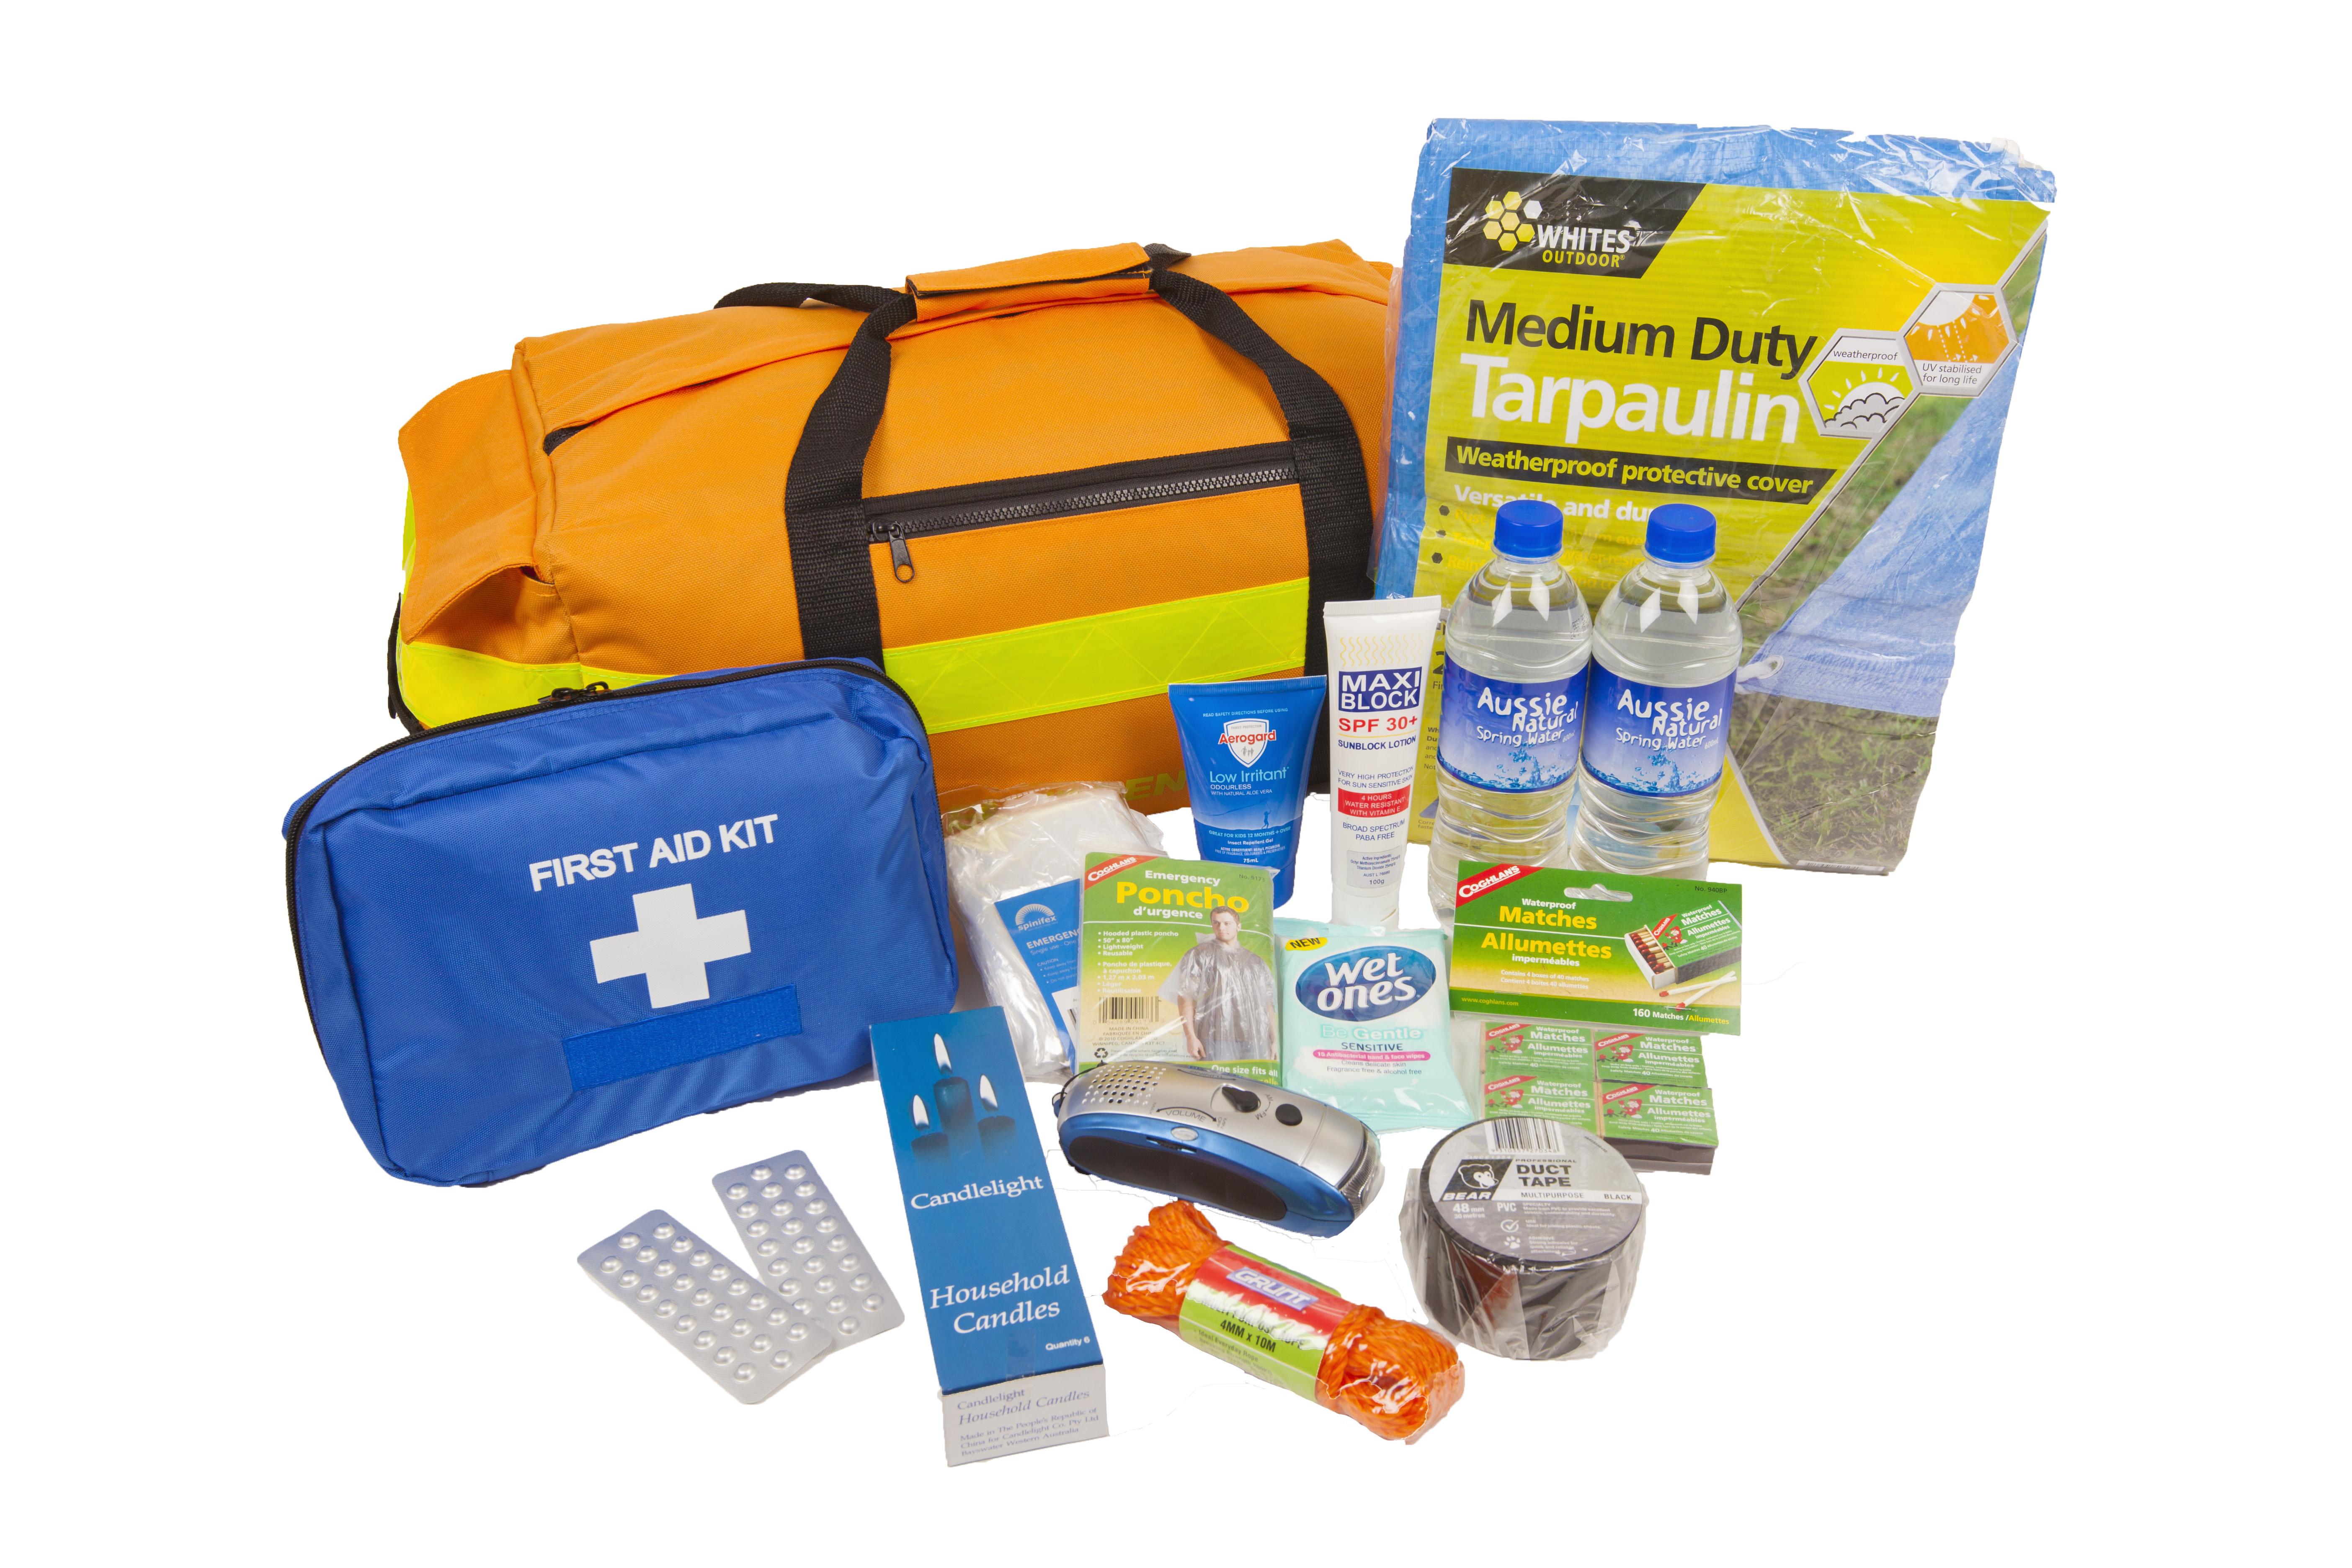 Cyclone Emergency Survival Kit